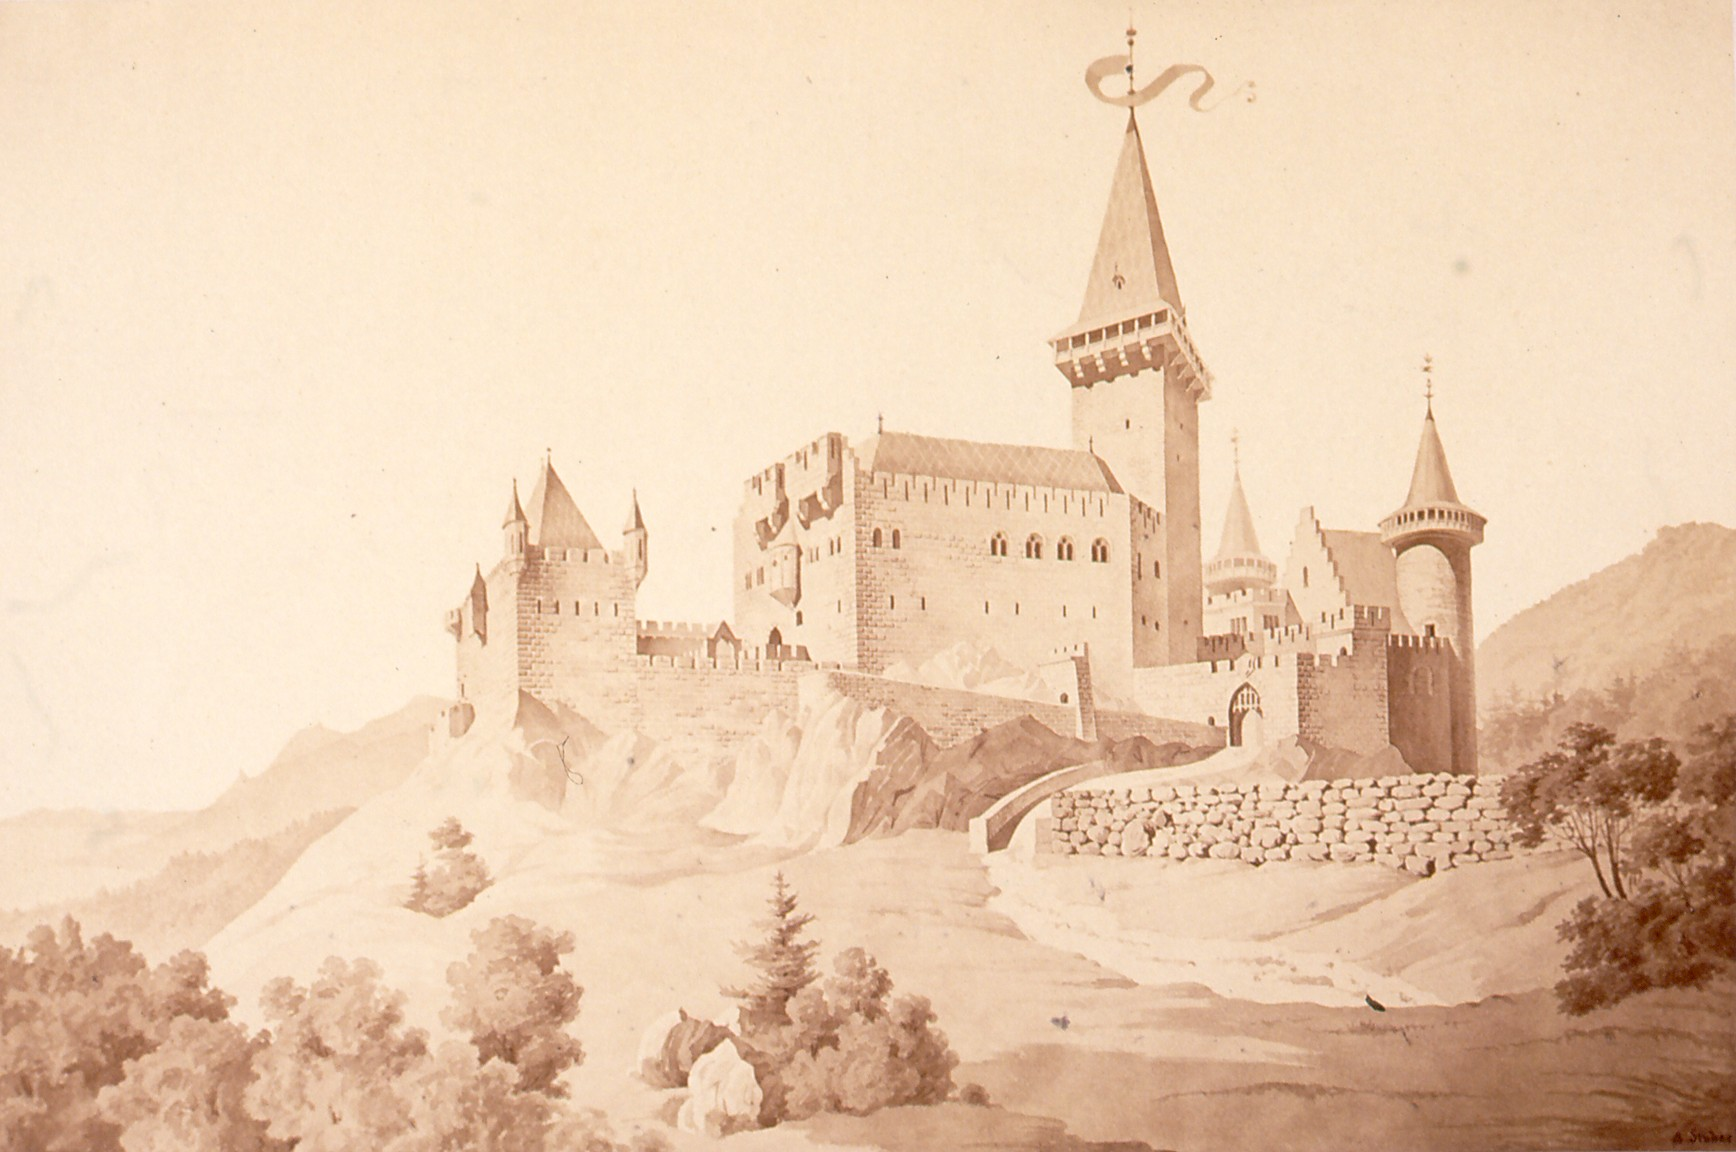 Chateau de Landsberg, прогулка с друзьями